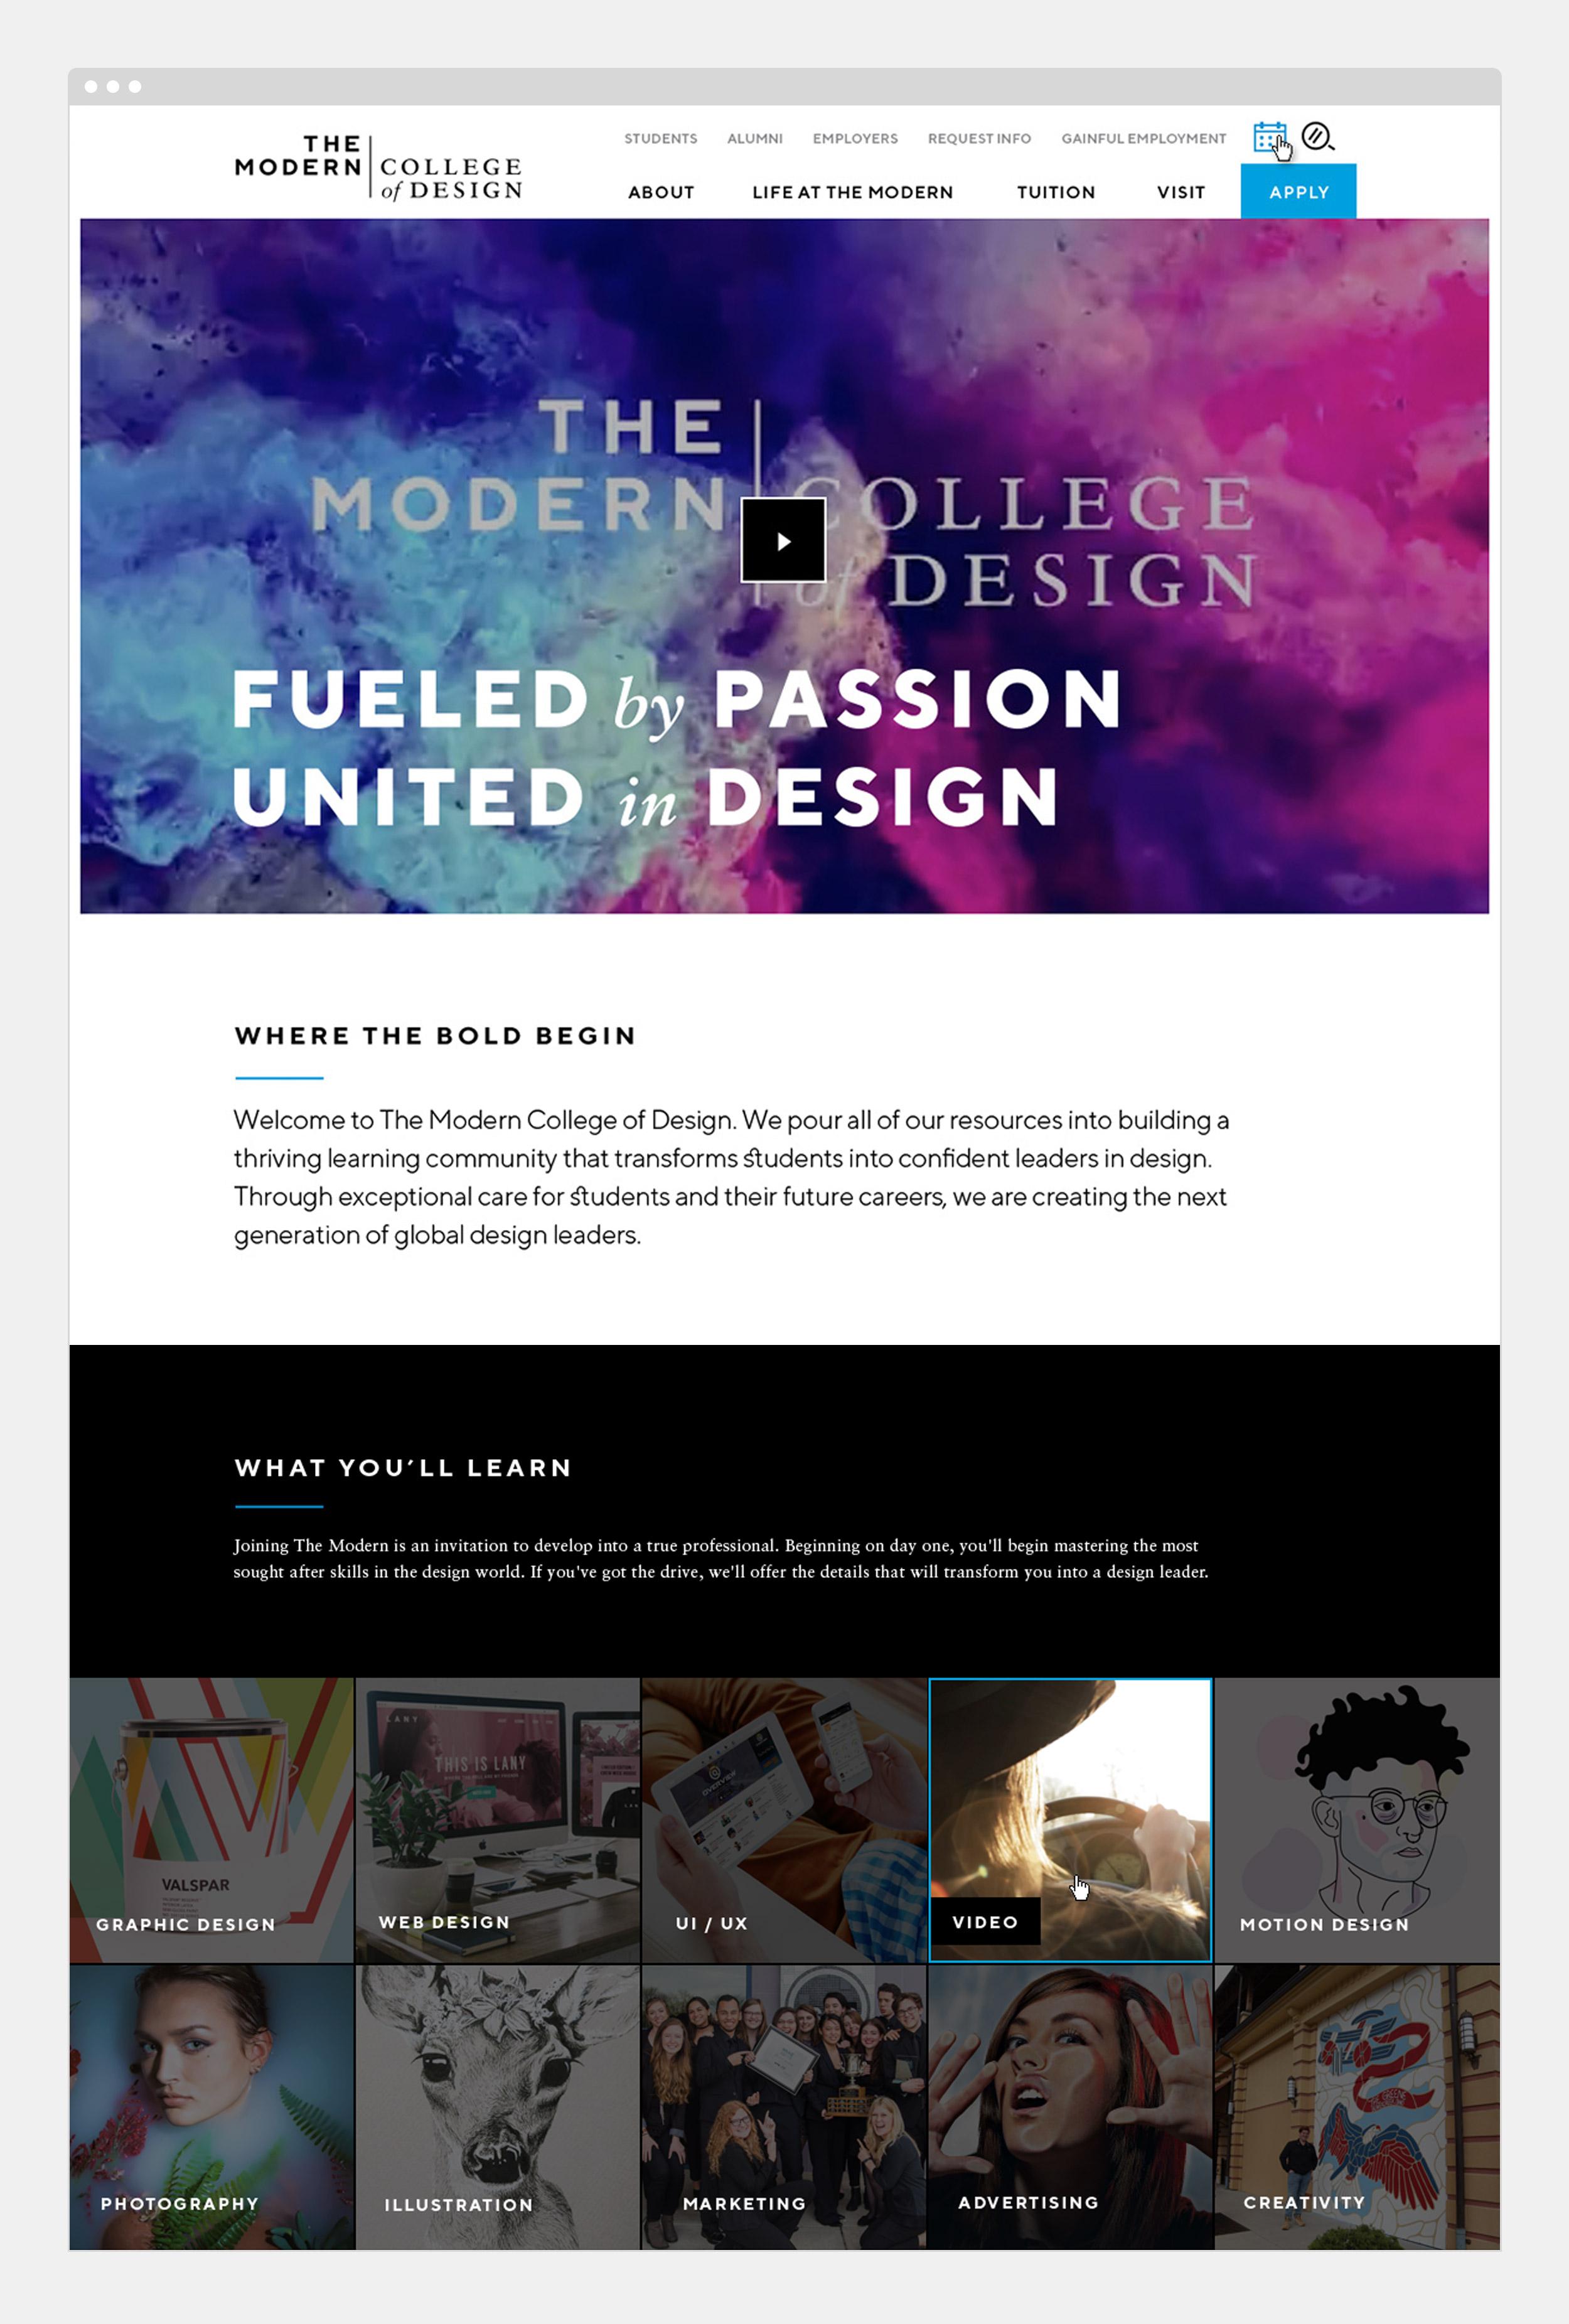 the-modern-college-of-design-website-01.jpg